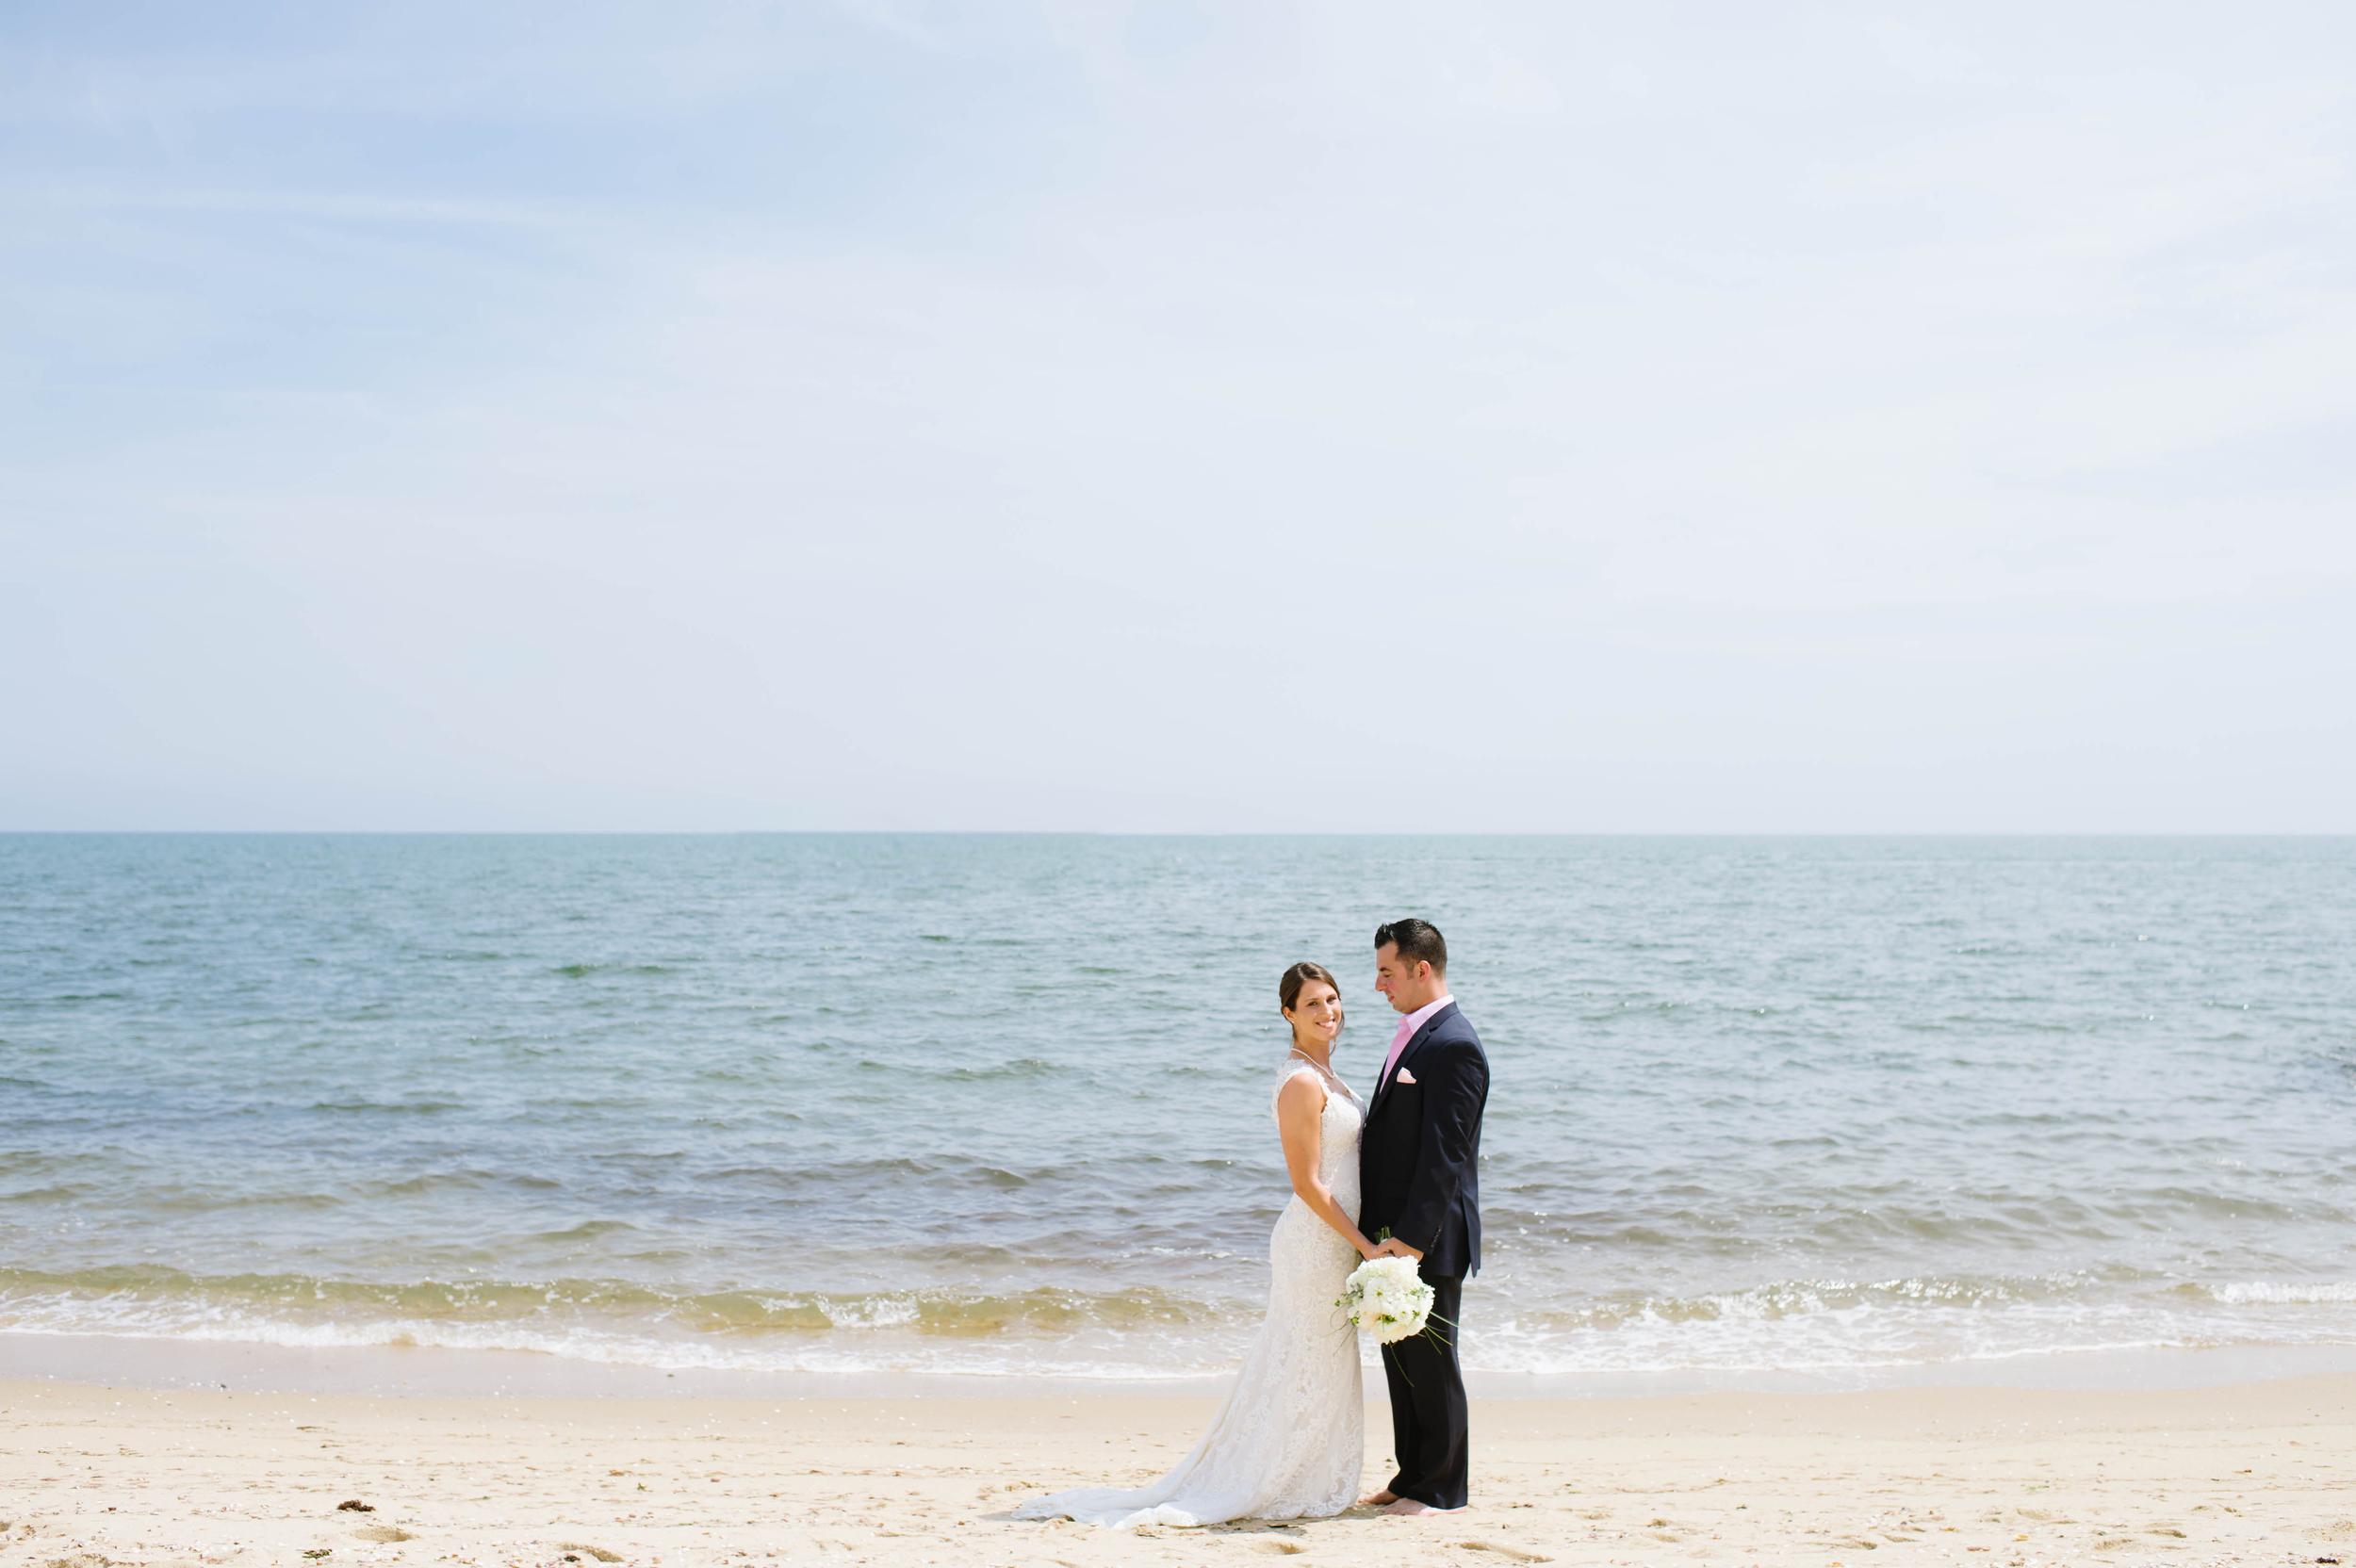 Creative_Wedding_Photography_Cape_Cod025.jpg